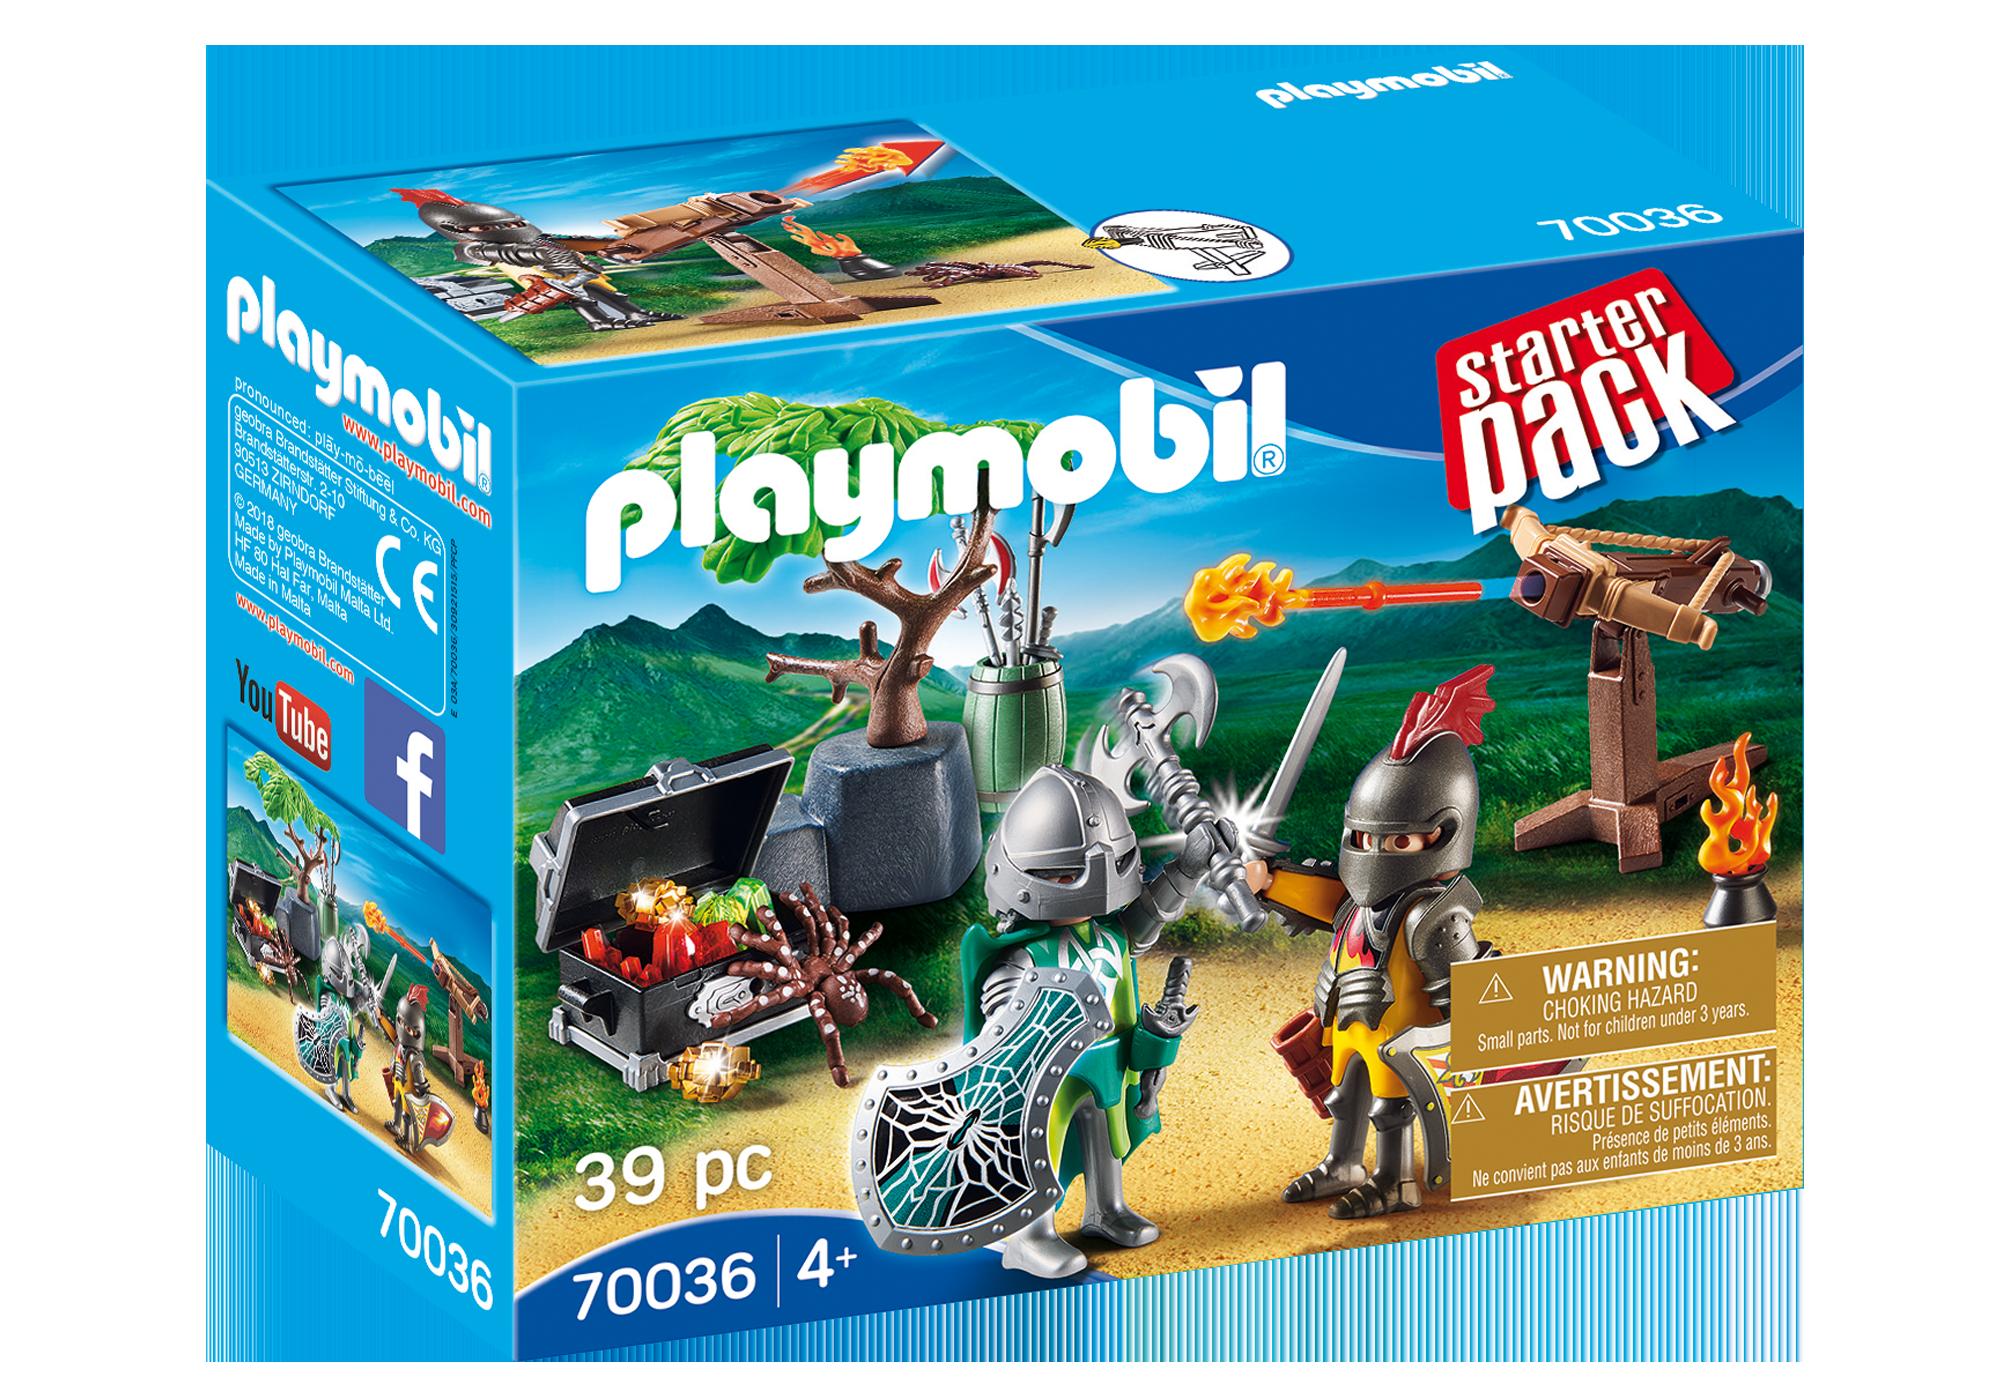 http://media.playmobil.com/i/playmobil/70036_product_box_front/StarterPack Knight's Treasure Battle